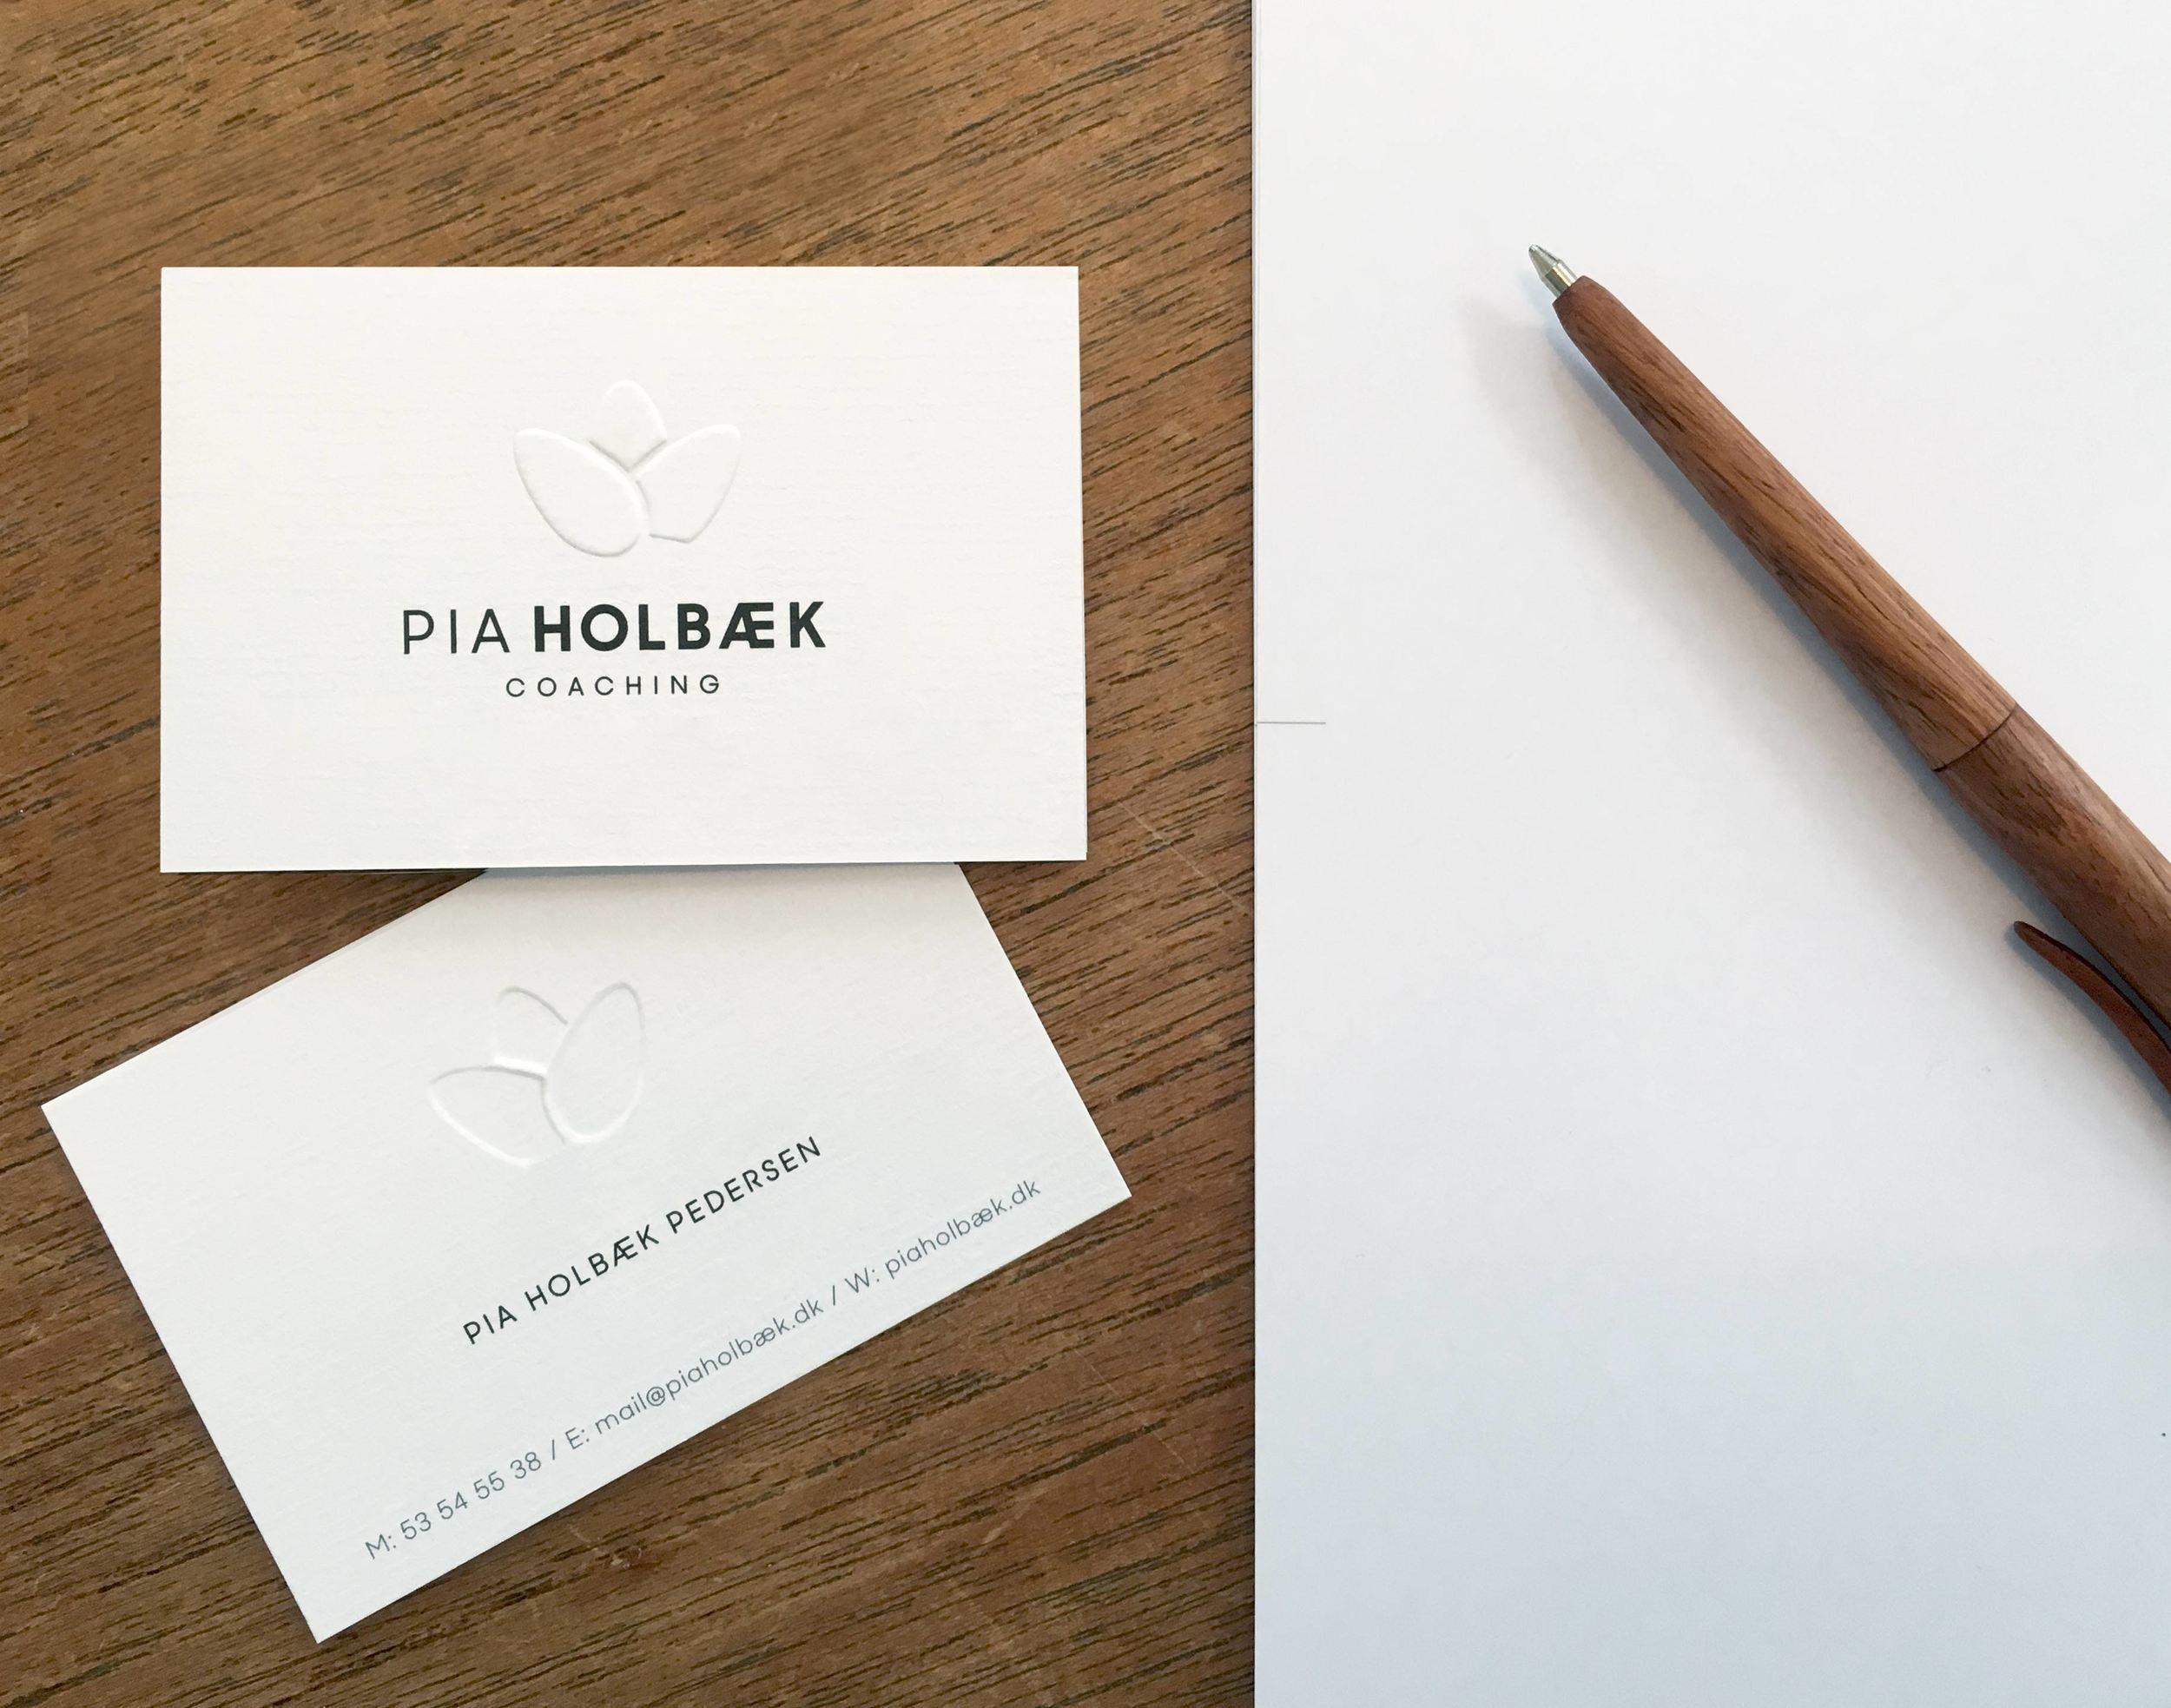 Pia Holbæk Coaching visitkort